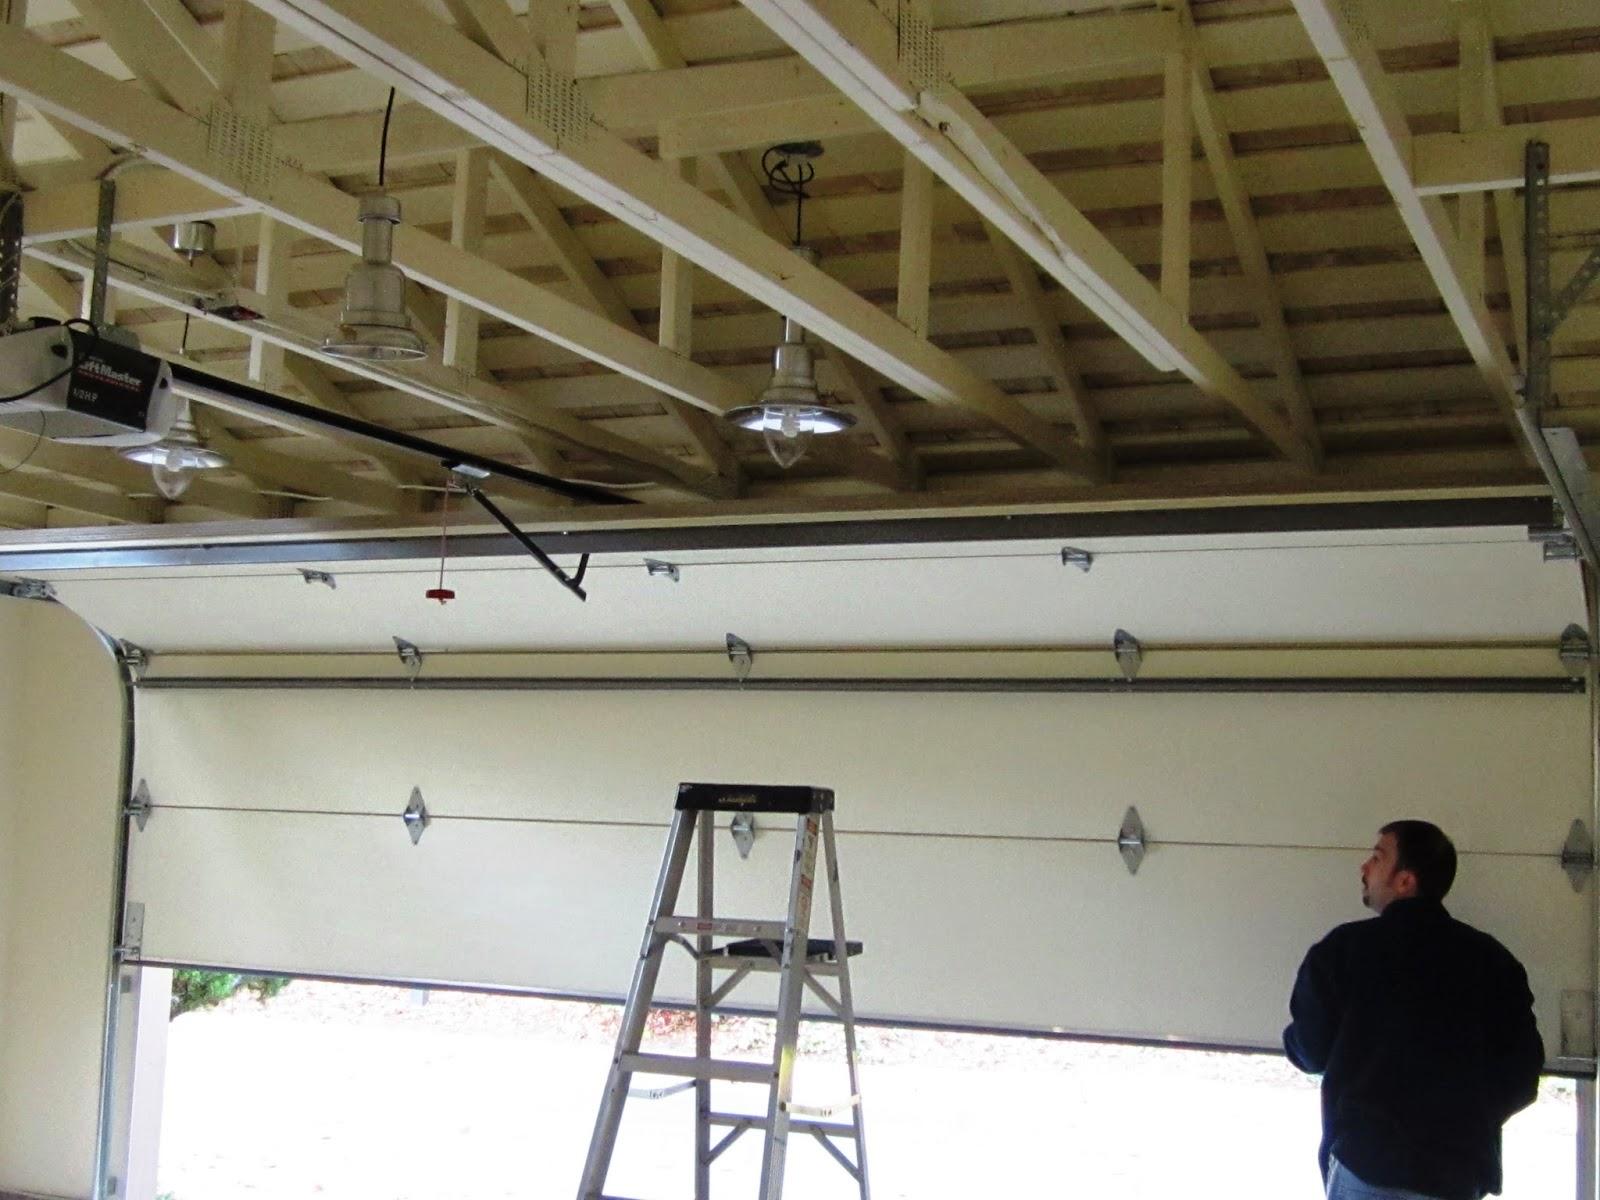 DIY Dithering : Lighting up the Garage!